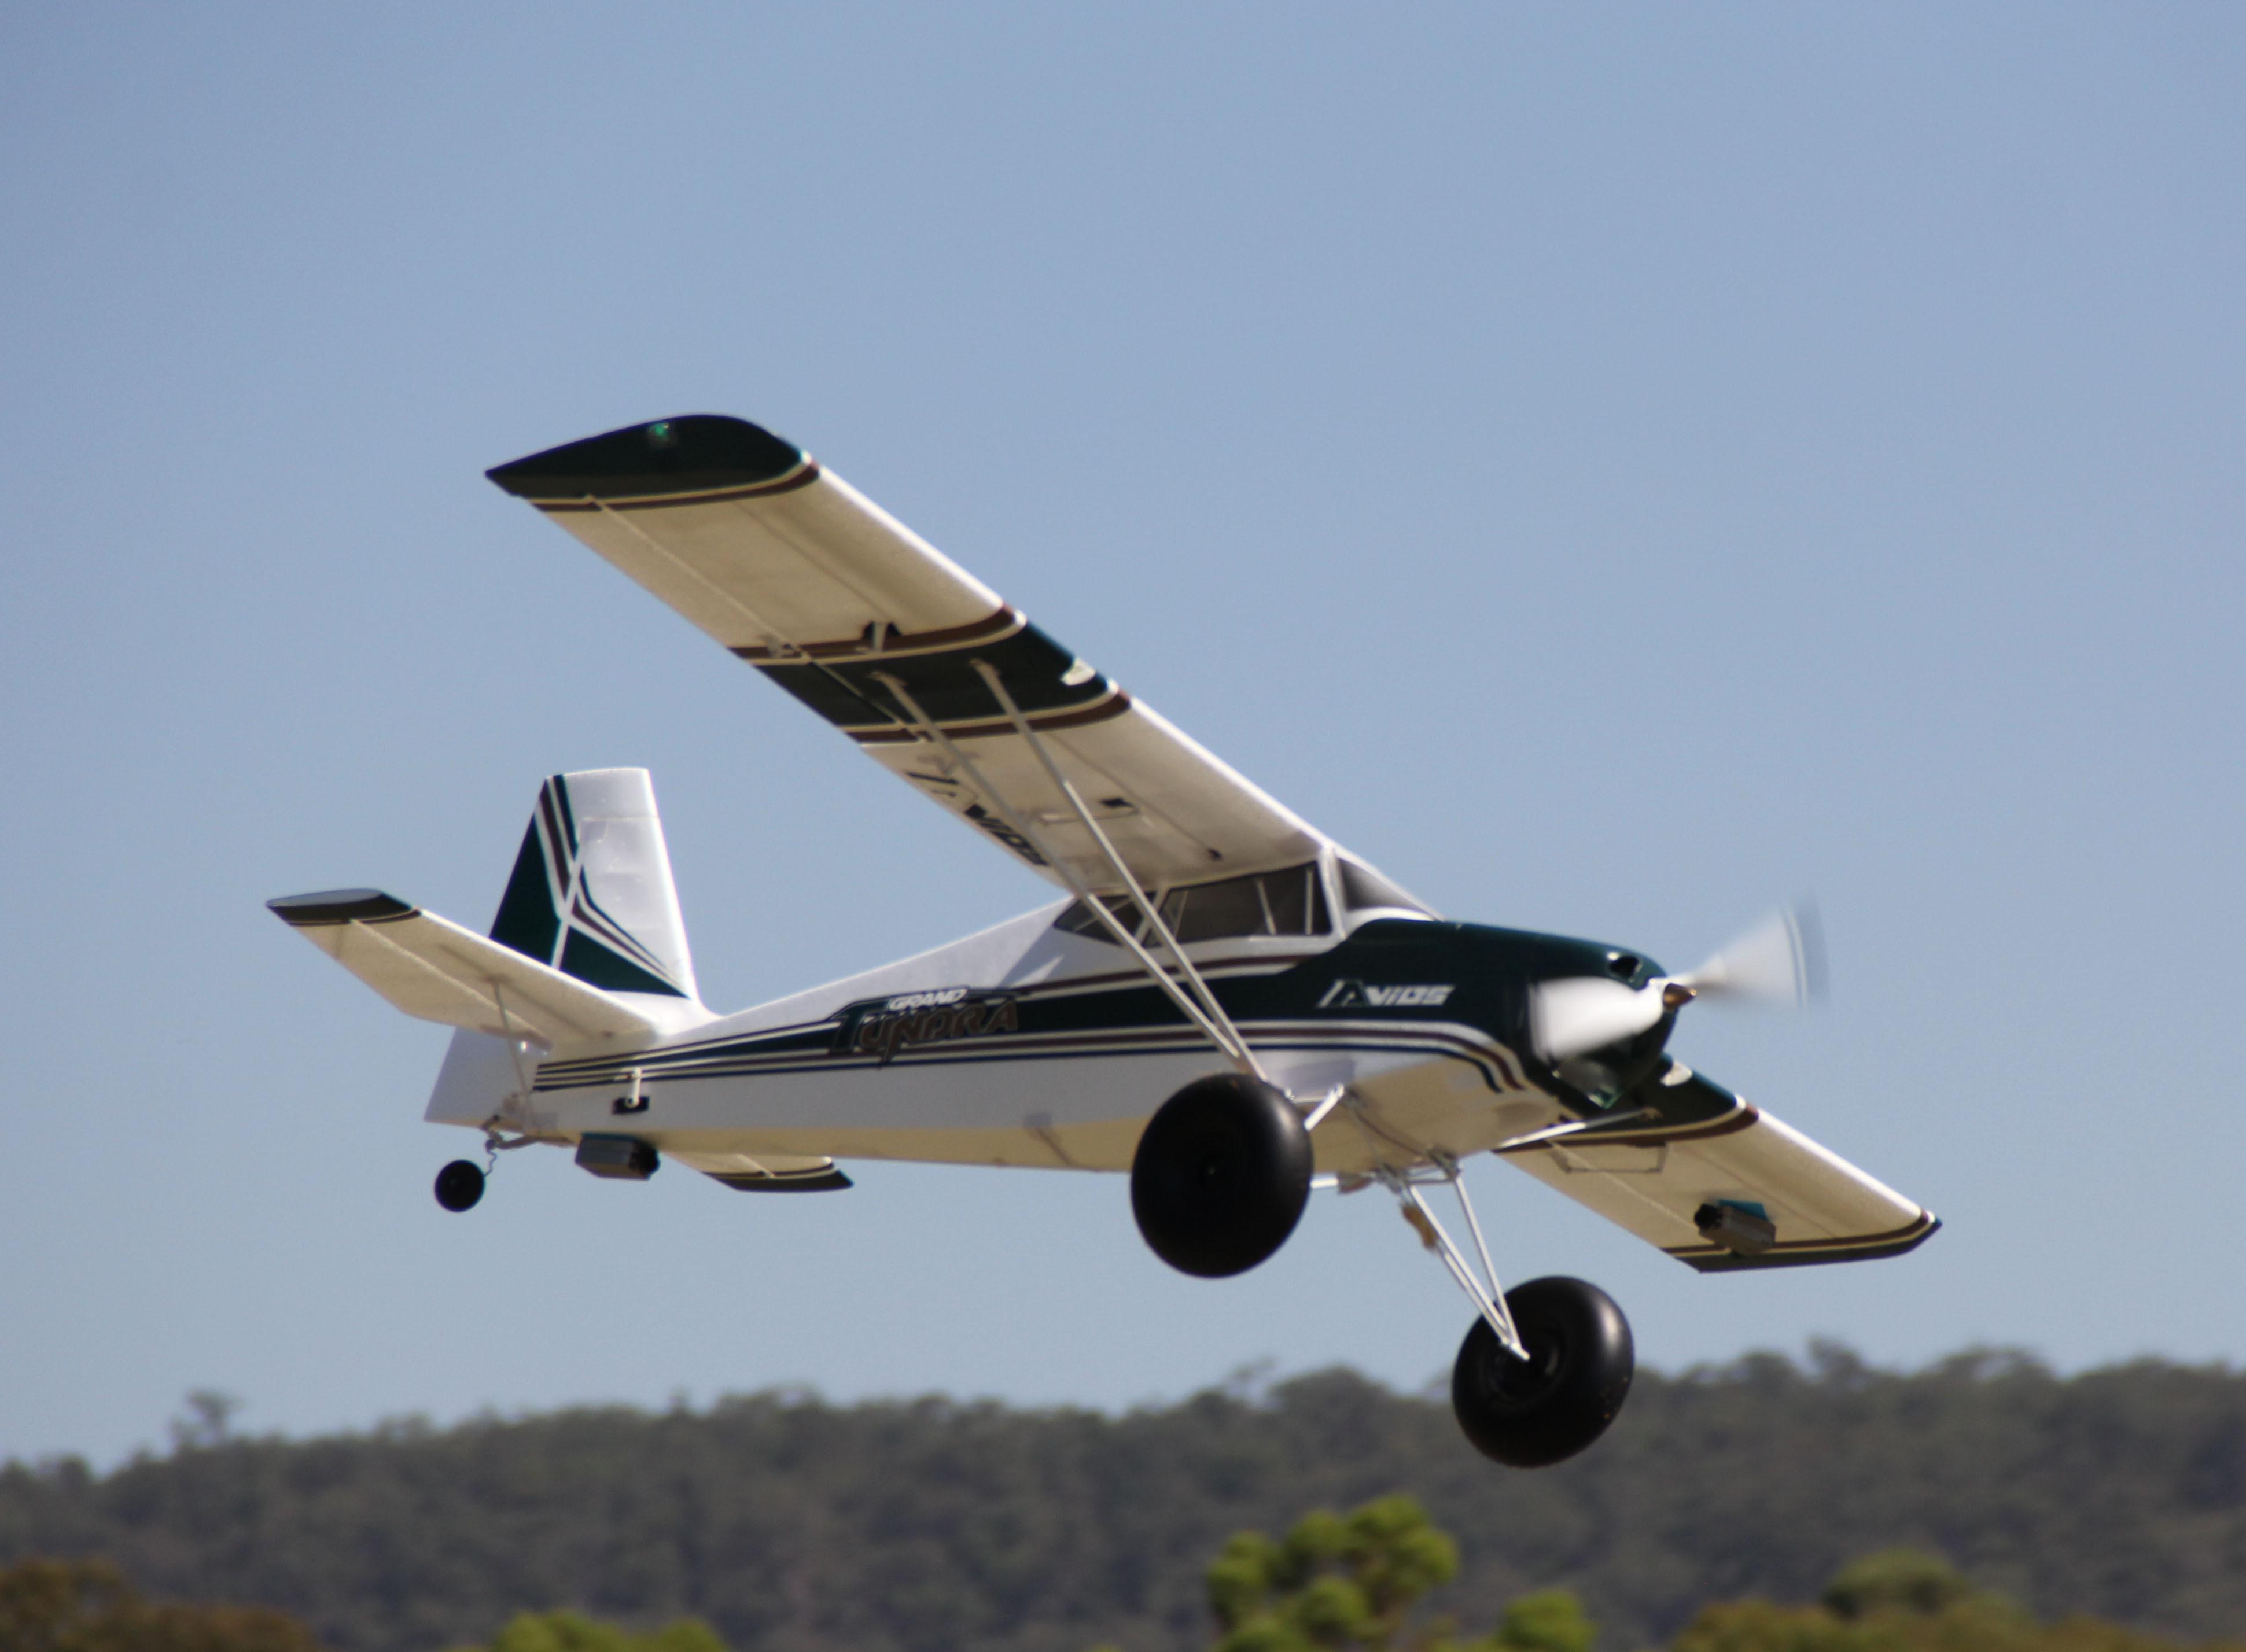 "Avion électrique Avios Grand Tundra - Green/Gold 1700mm (67"") Sports Model (PNF)"